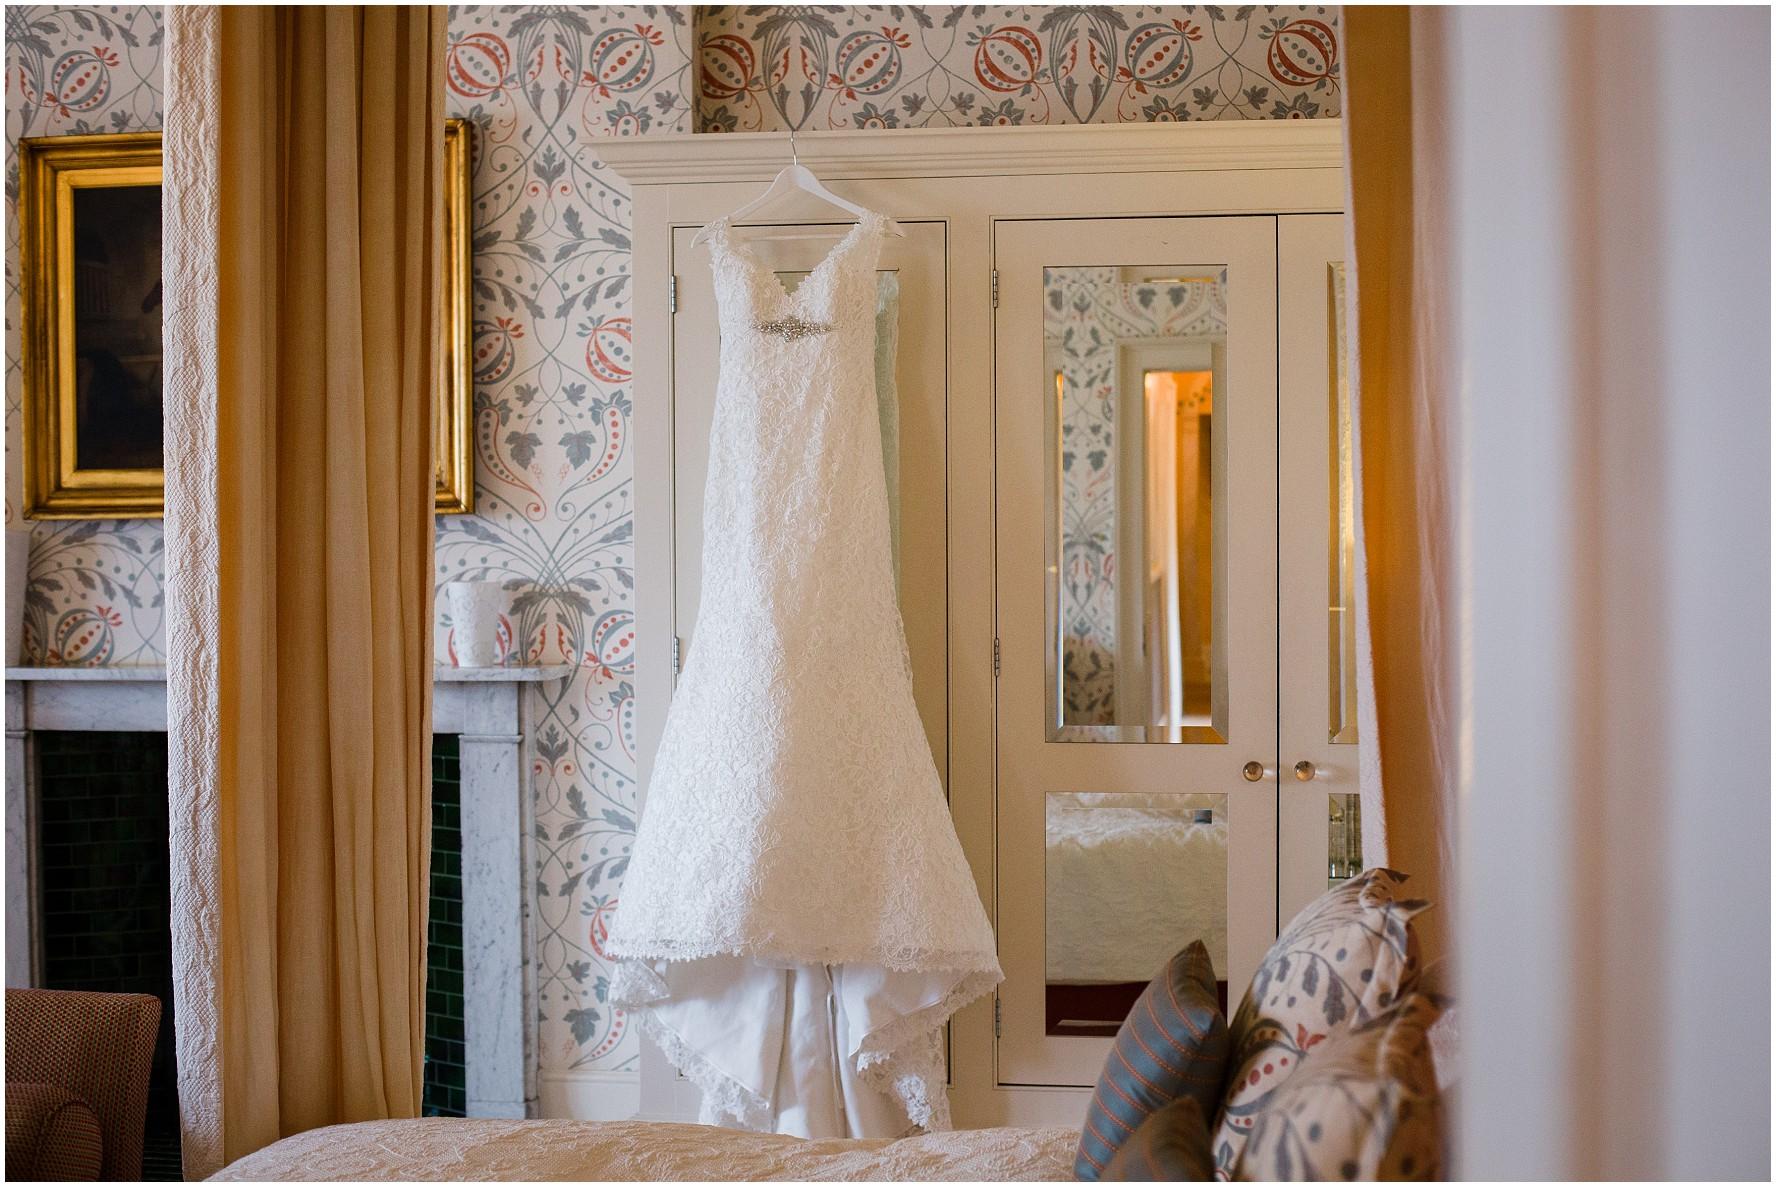 Hodsock Priory Bridal suite